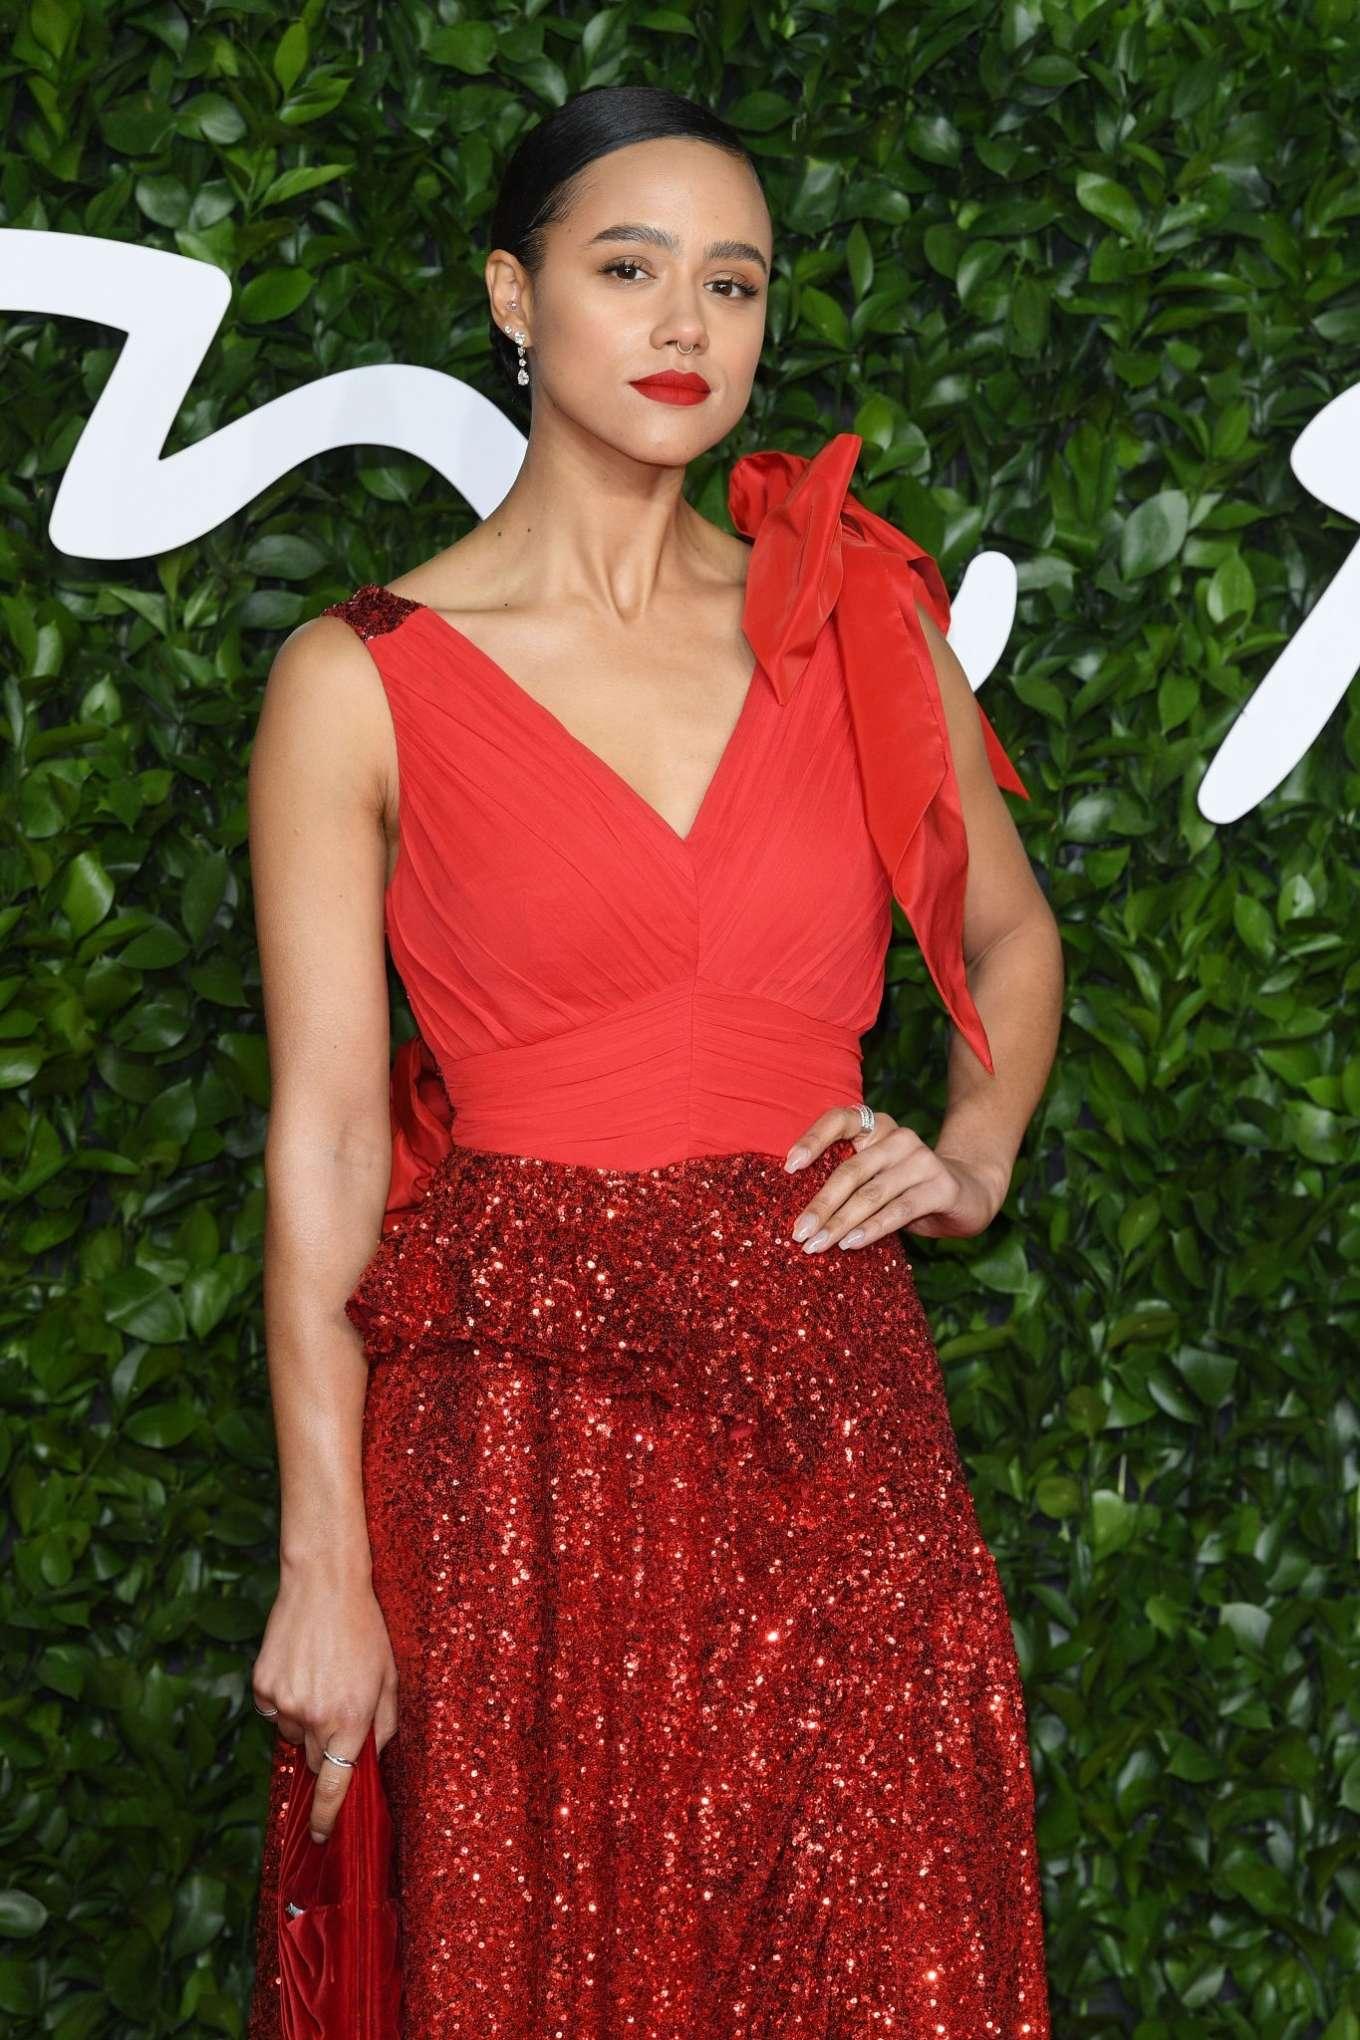 Nathalie Emmanuel - Fashion Awards 2019 in London